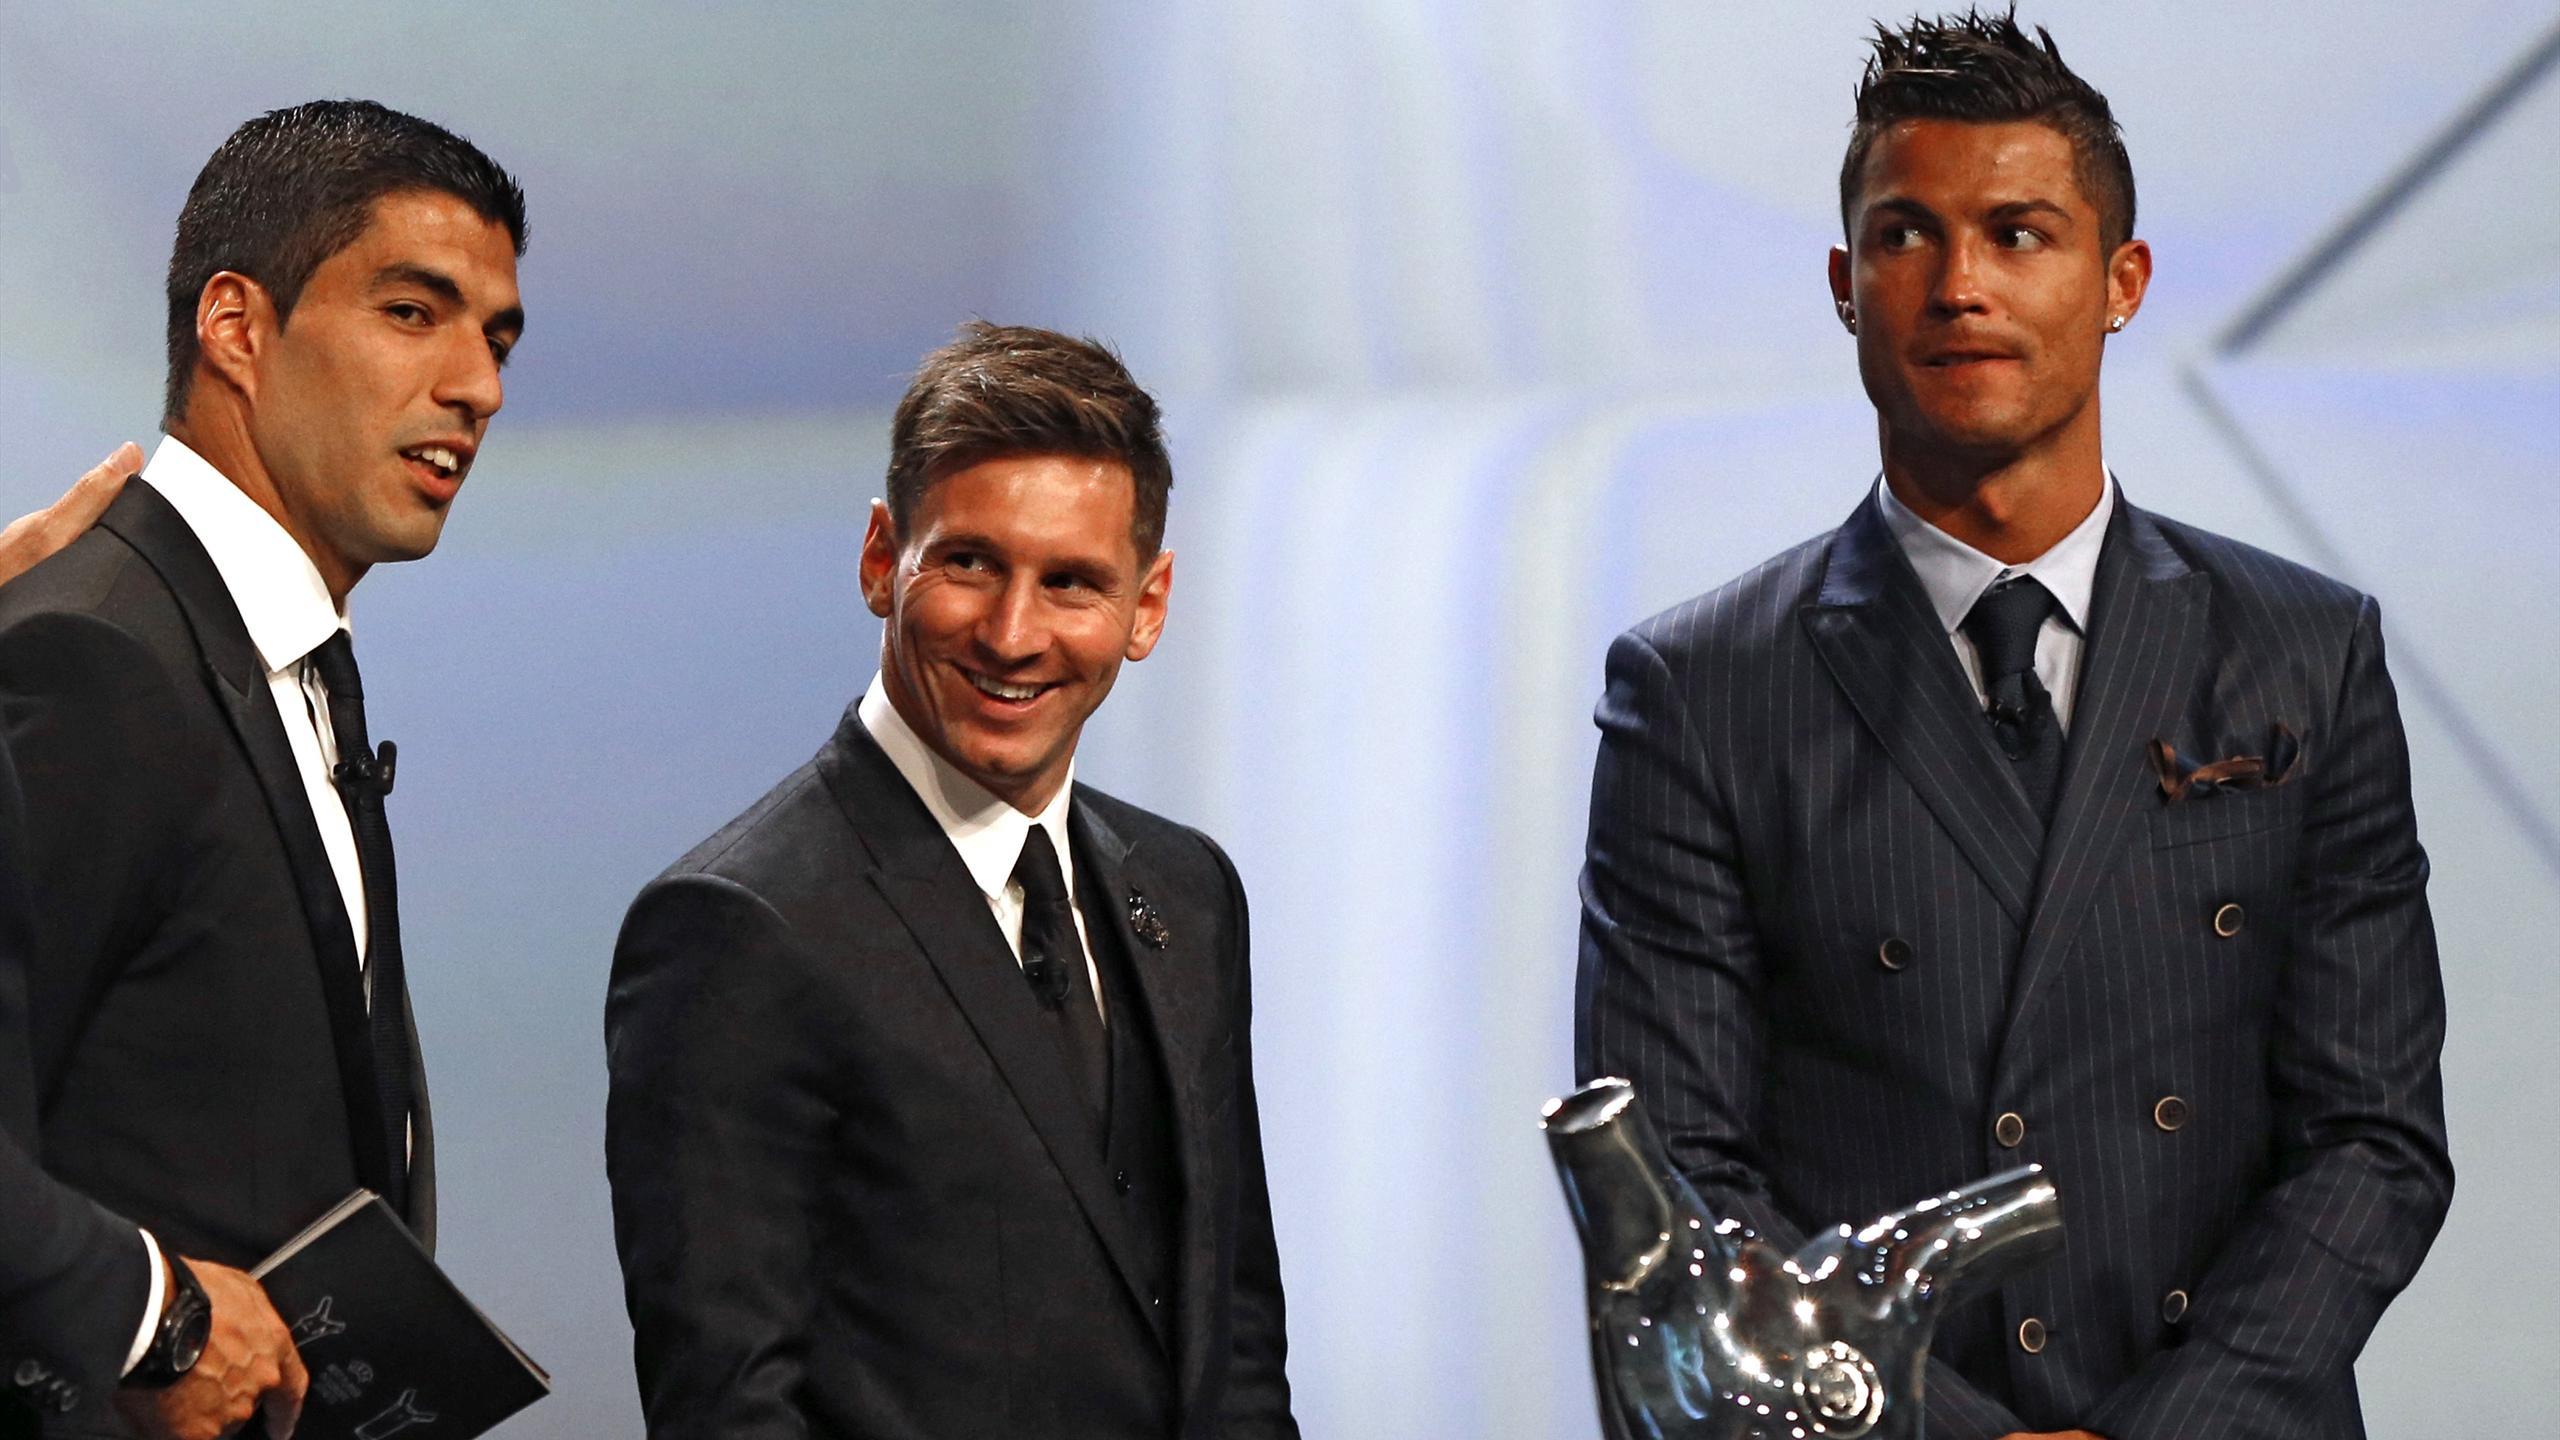 Barcelona's Luis Suarez and Lionel Messi and Real Madrid's Cristiano Ronaldo